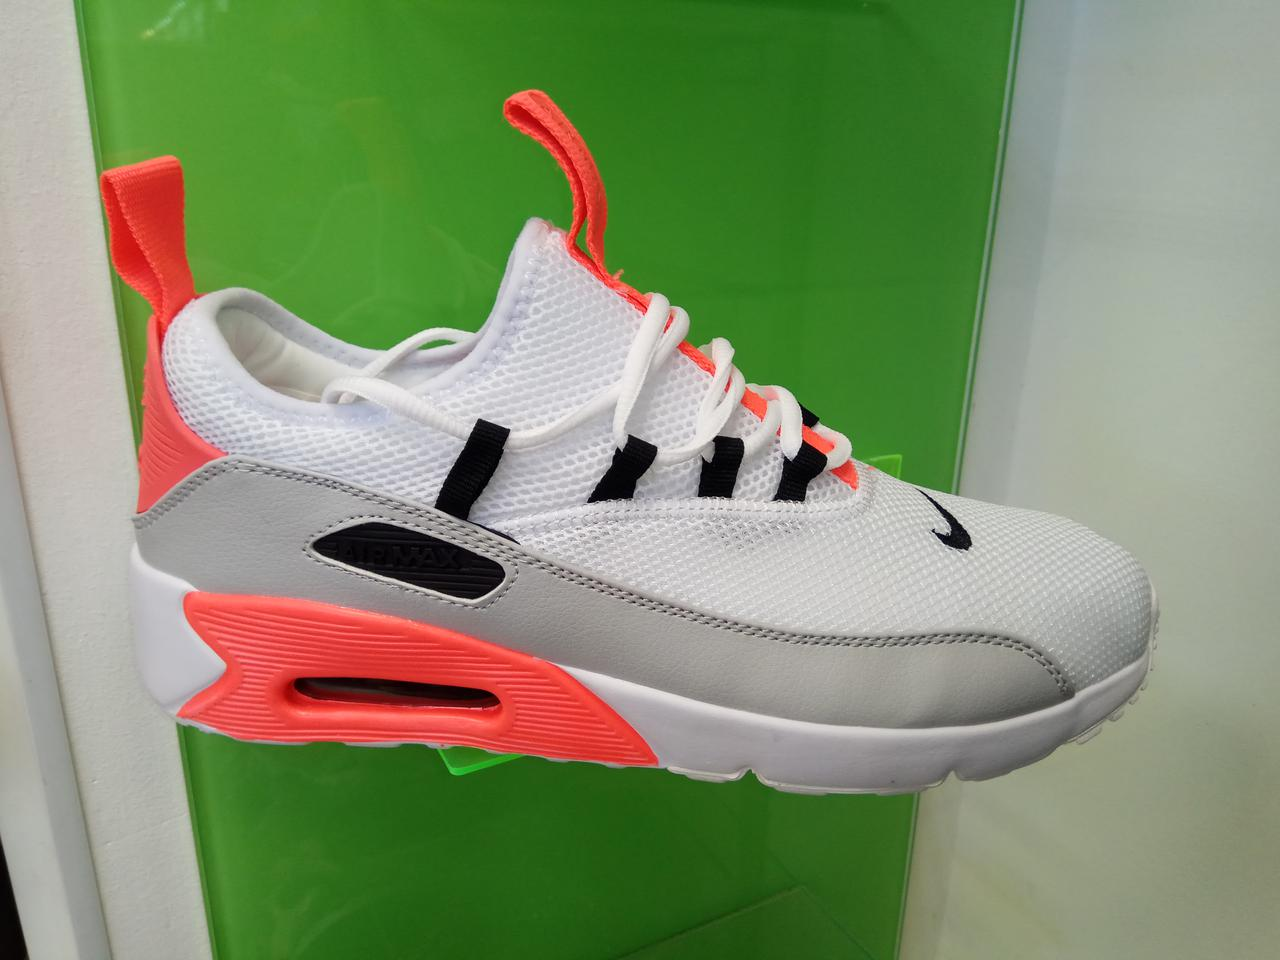 6c341248b681c0 Мужские кроссовки Nike Air Max 90 EZ White & red & grey - Интернет магазин  krossovkiweb